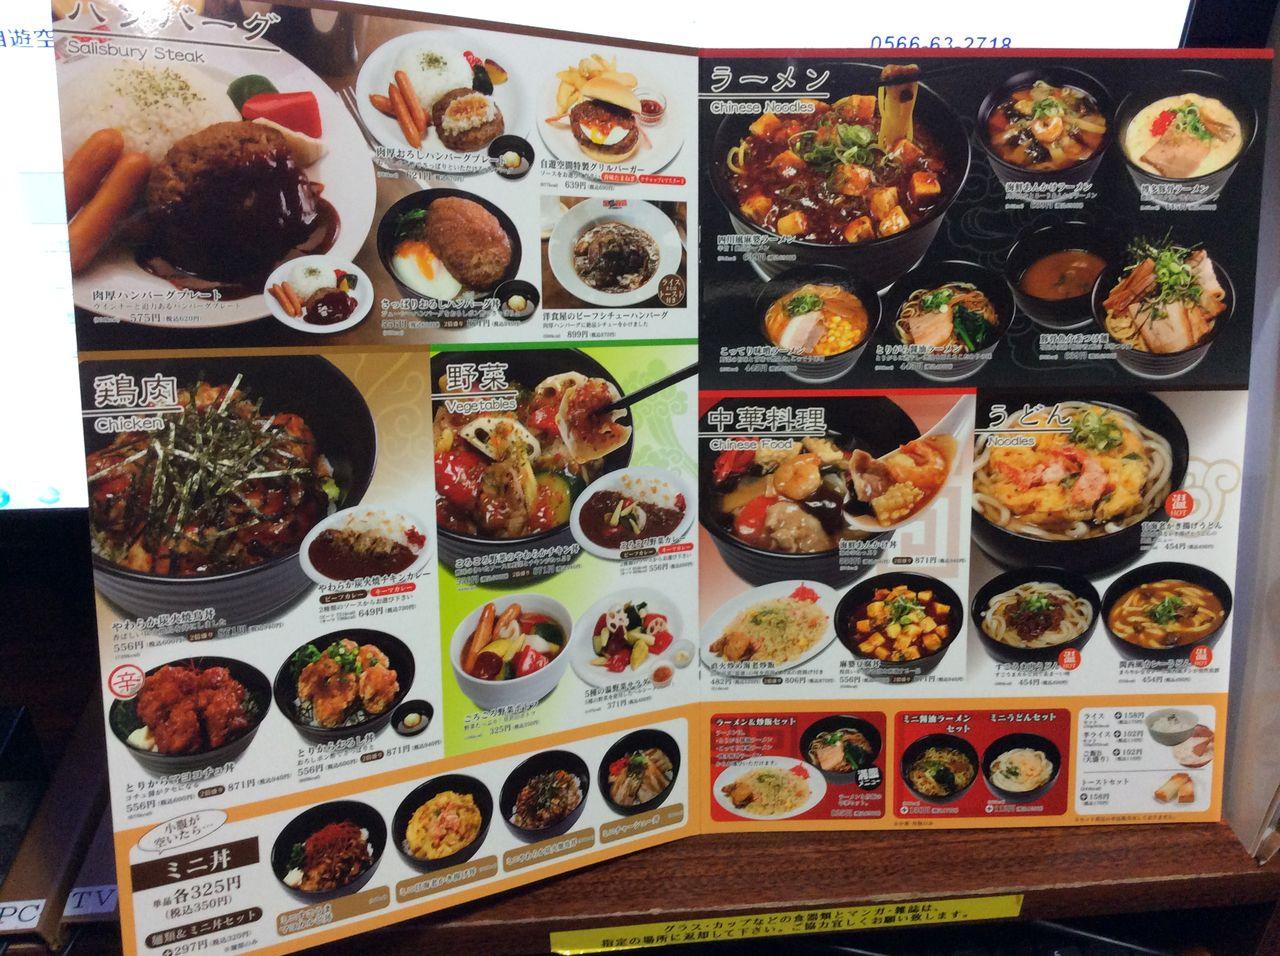 http://livedoor.blogimg.jp/yosiyosi128128/imgs/5/f/5f3e7b8a.jpg